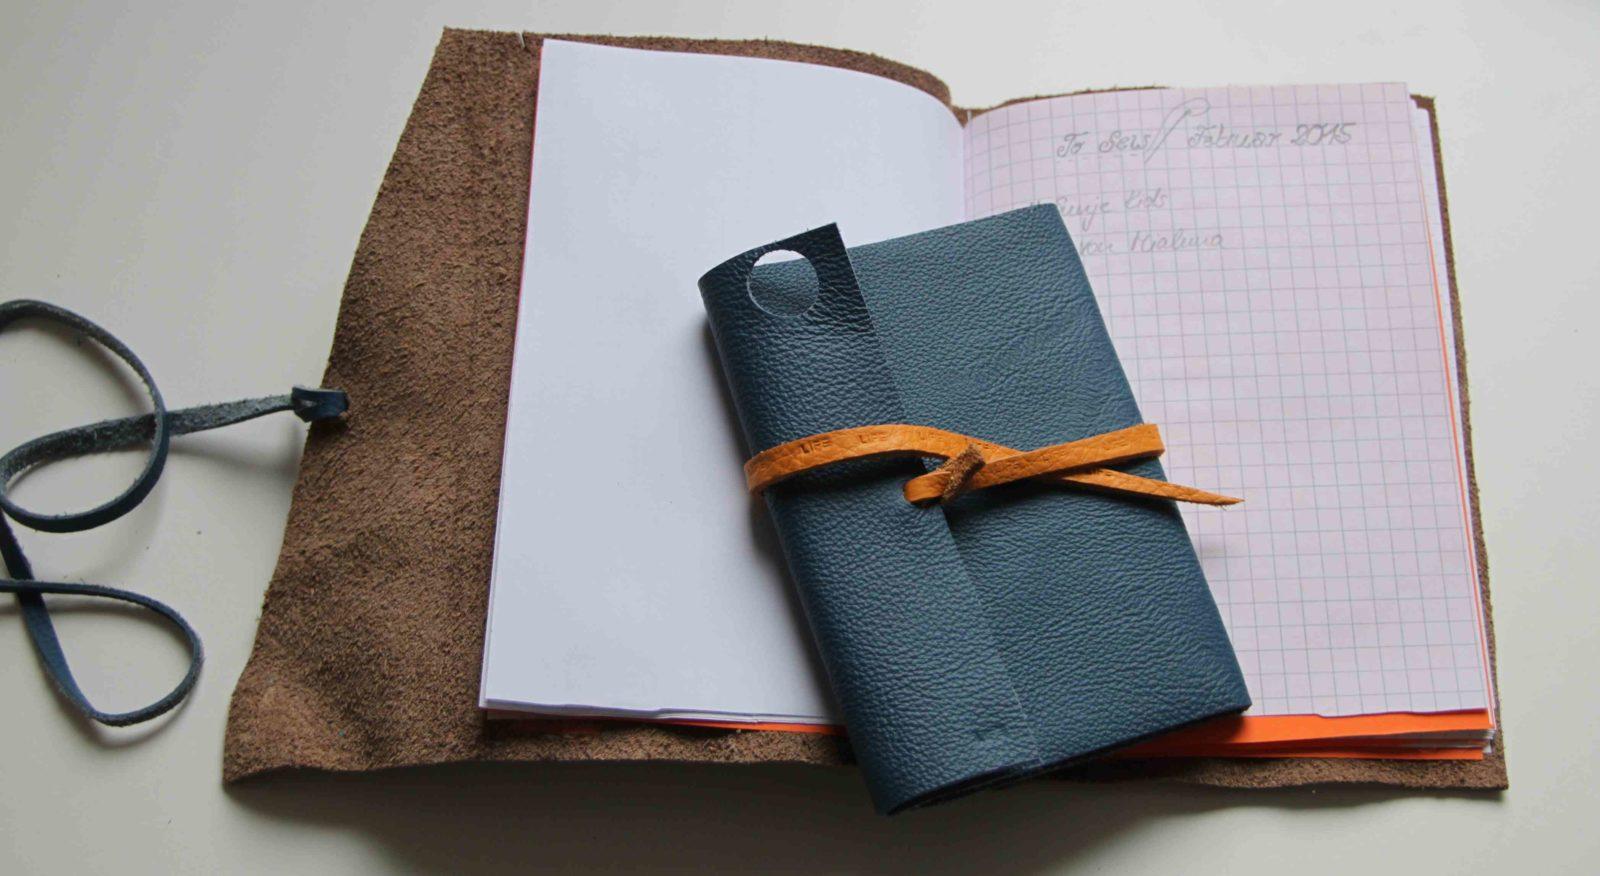 Notizbuch Mit Ledereinband Handmade Kultur